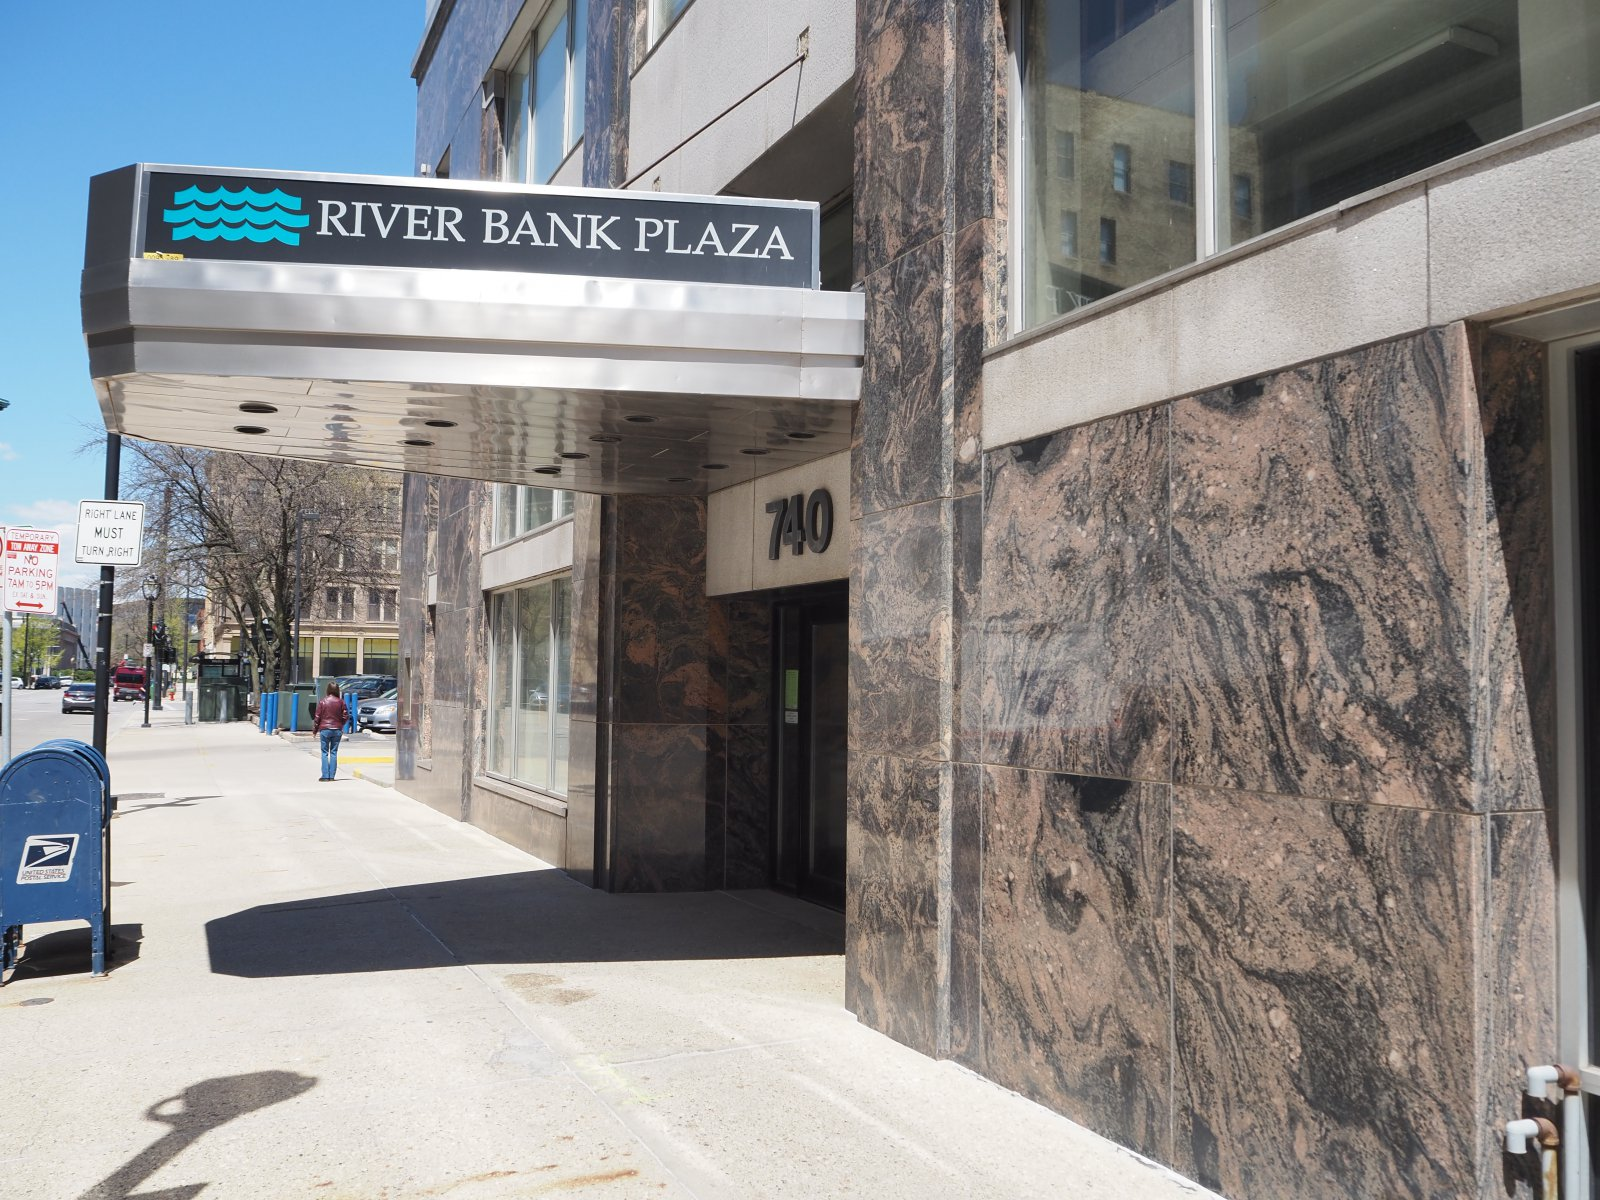 River Bank Plaza